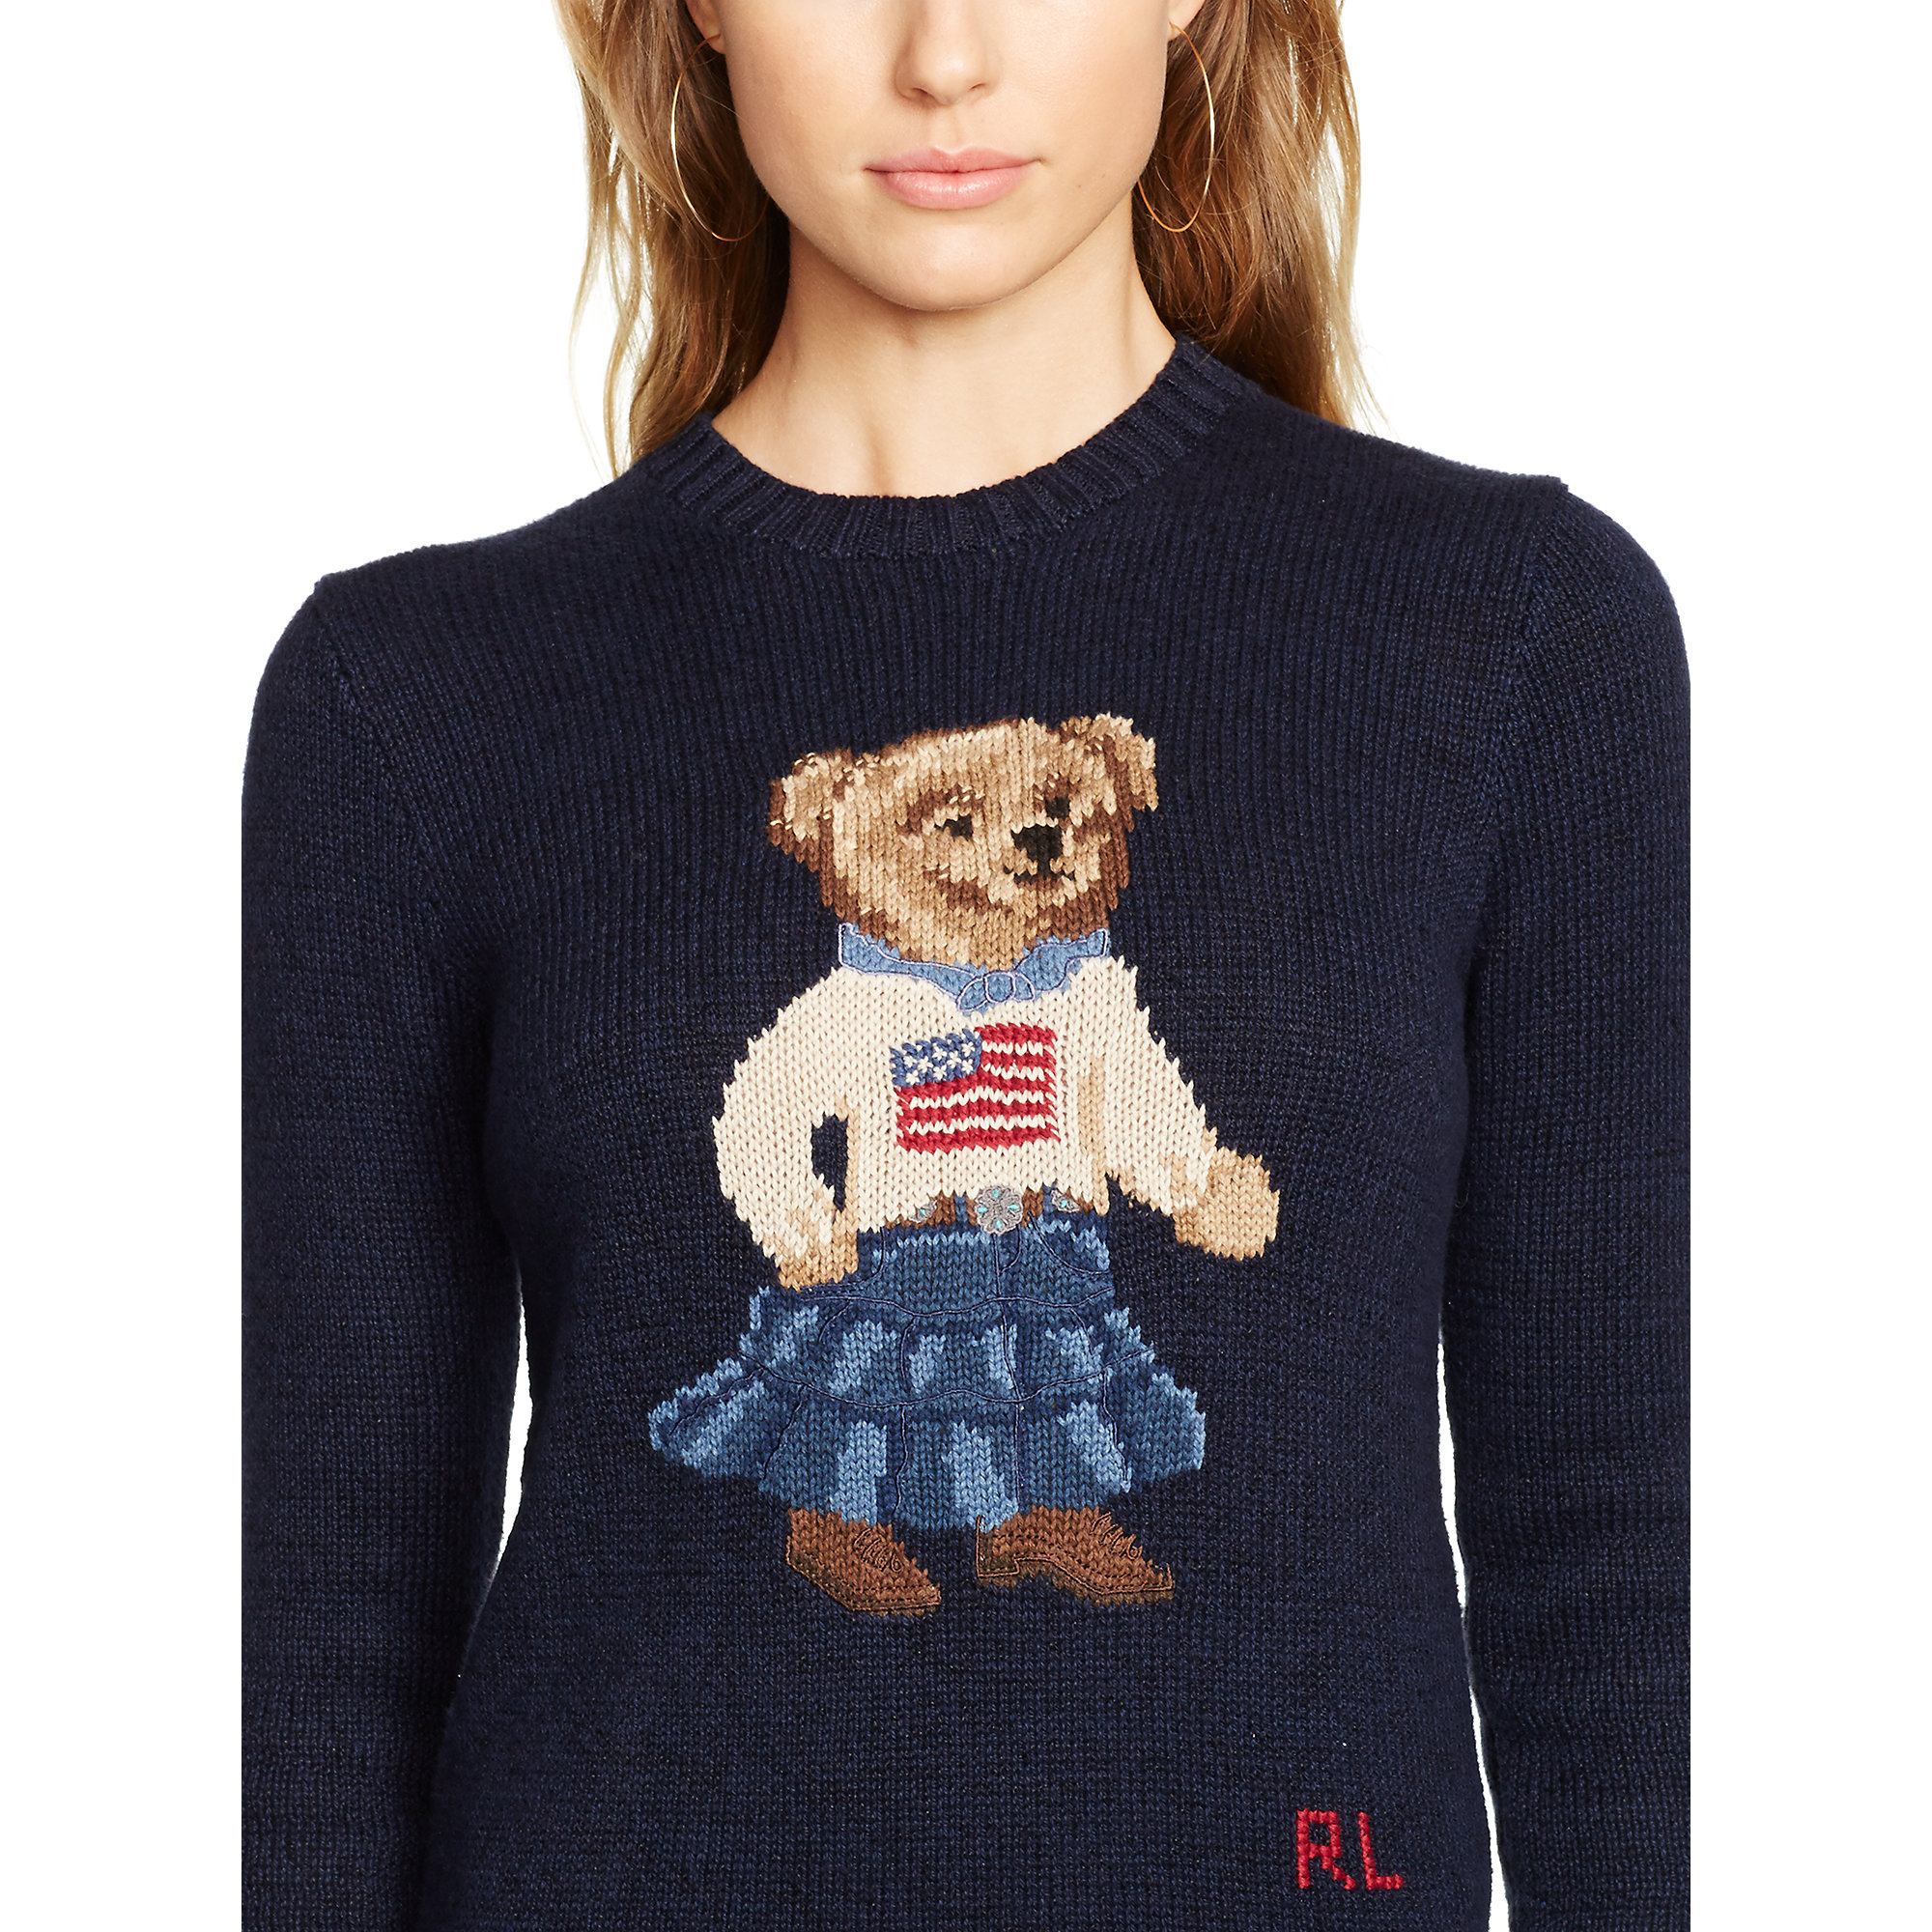 065e23c5a2b8 Lyst - Polo Ralph Lauren Pima Cotton Bear Sweater in Blue